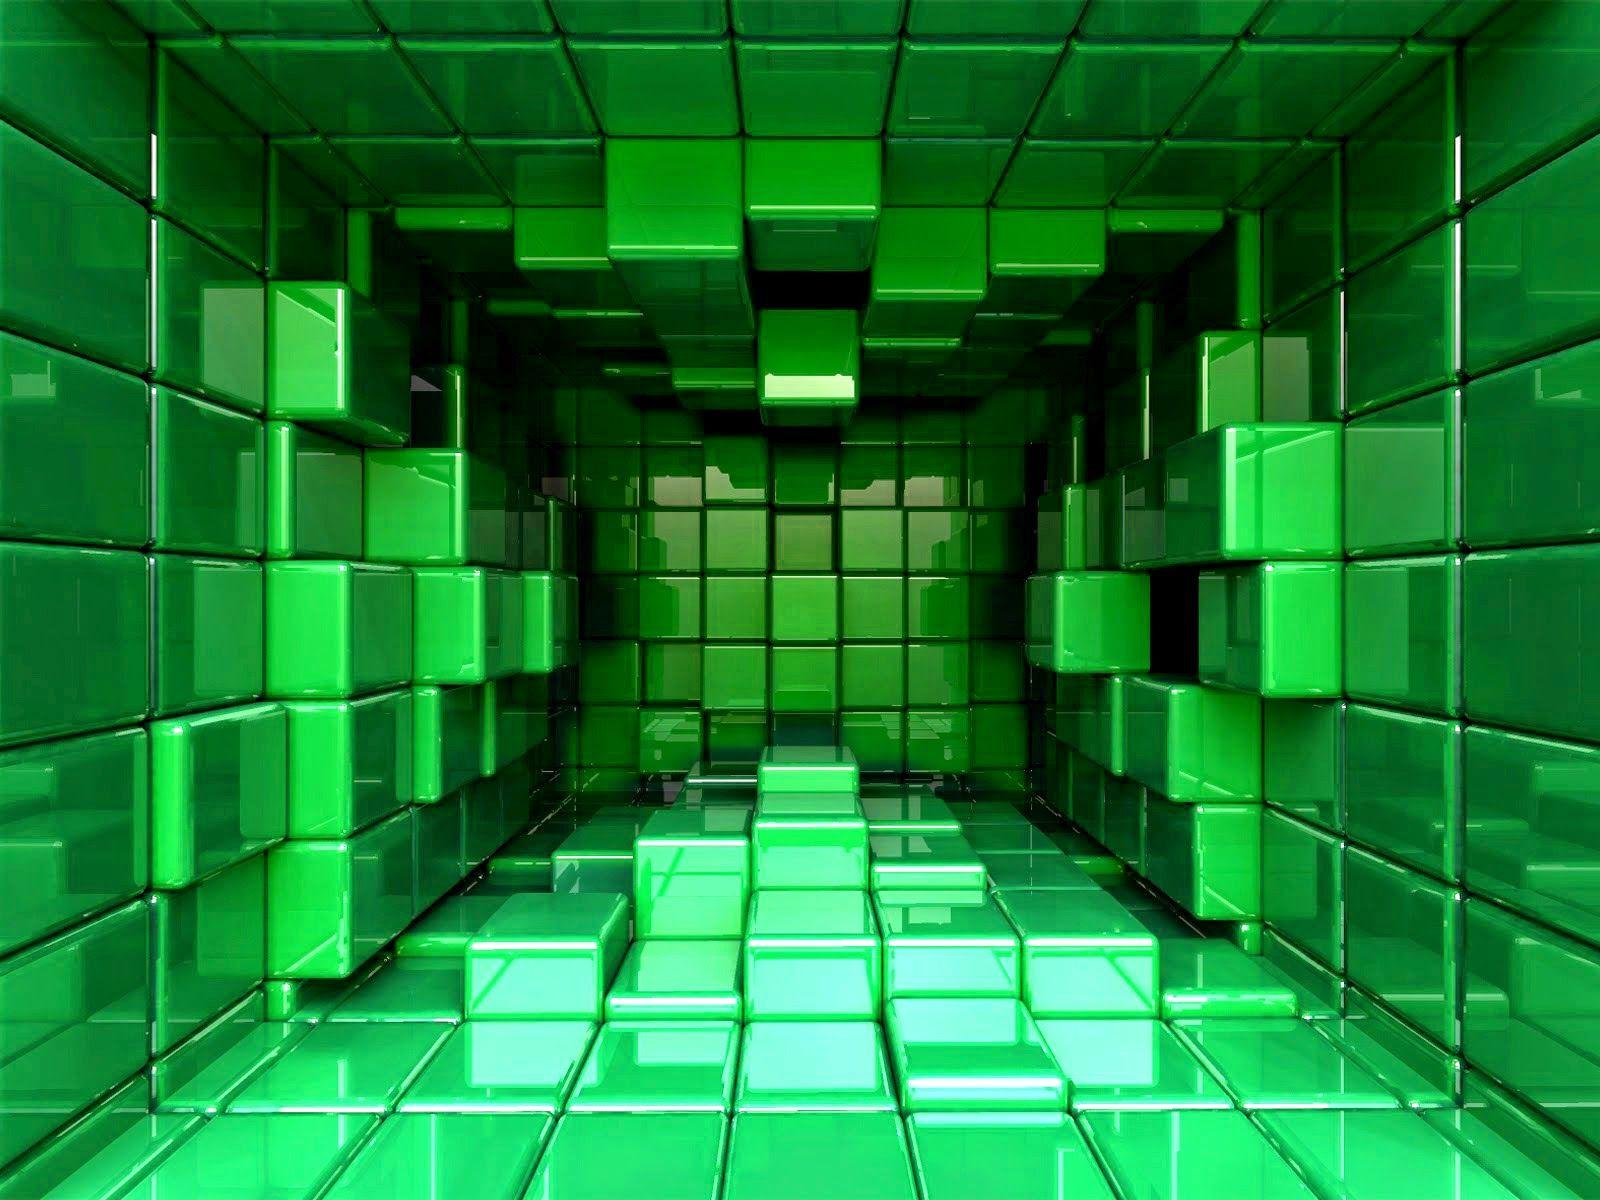 wallpaper's station: 3d wallpapers | desktop backgrounds free